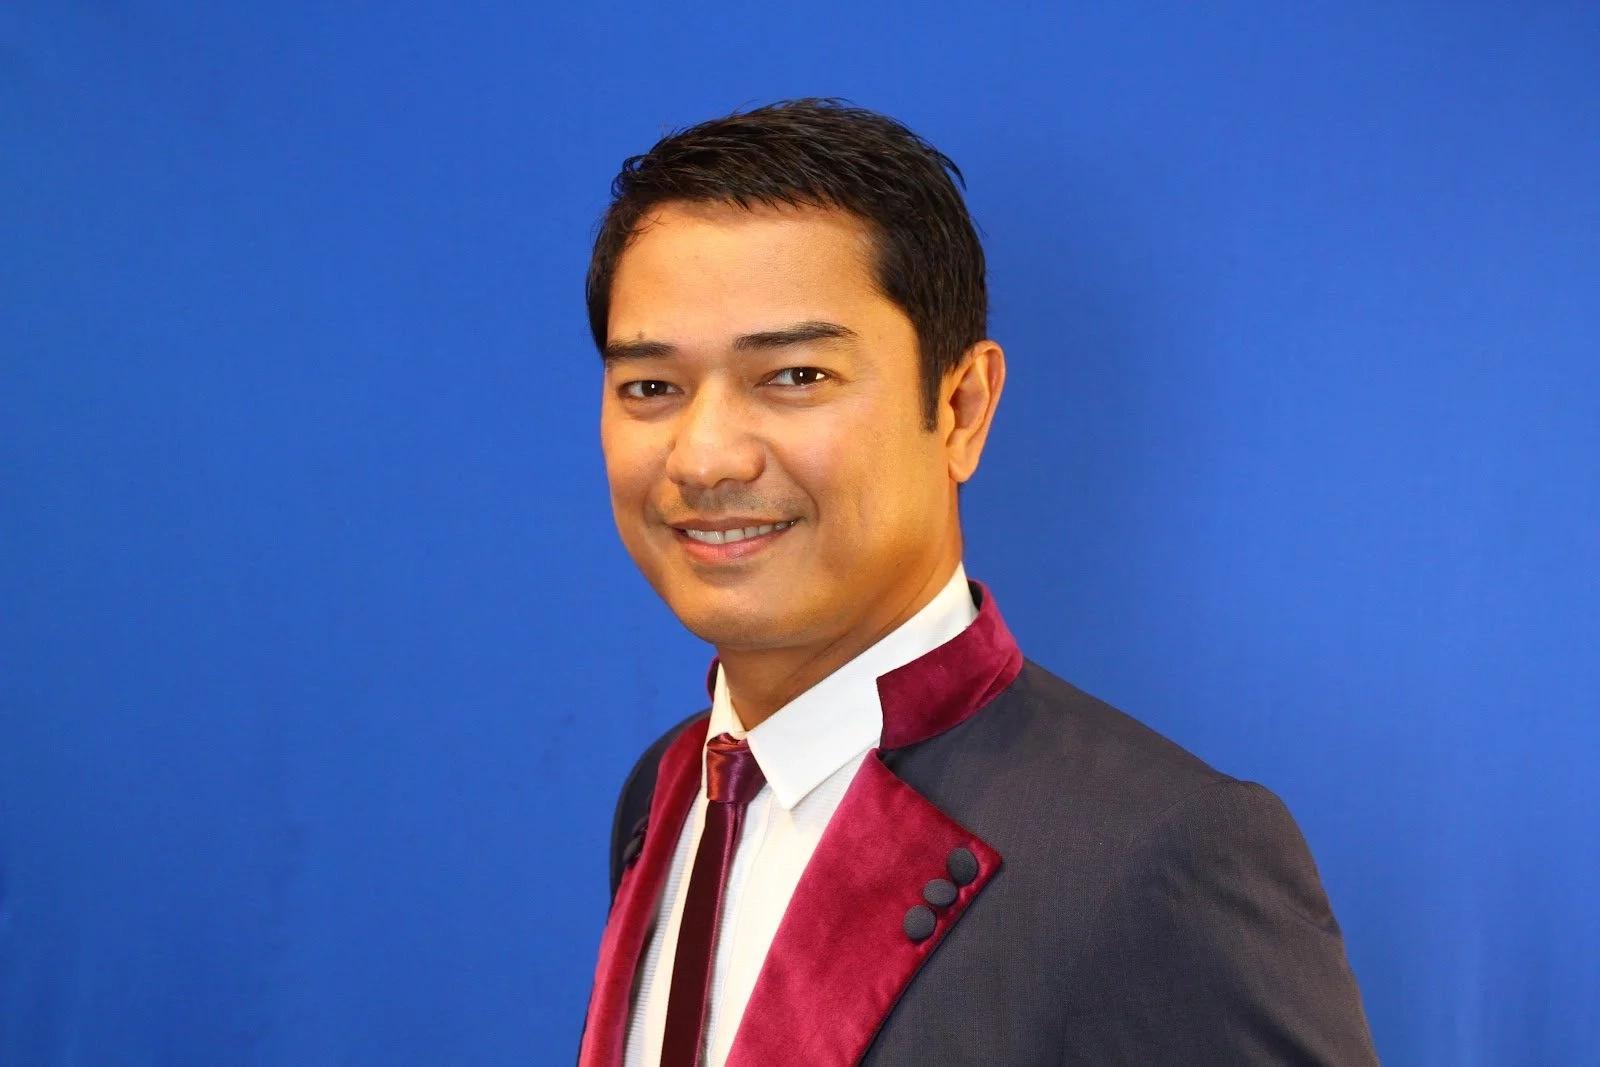 Ariel Rivera, balik Kapamilya: After a year of being in Kapuso network